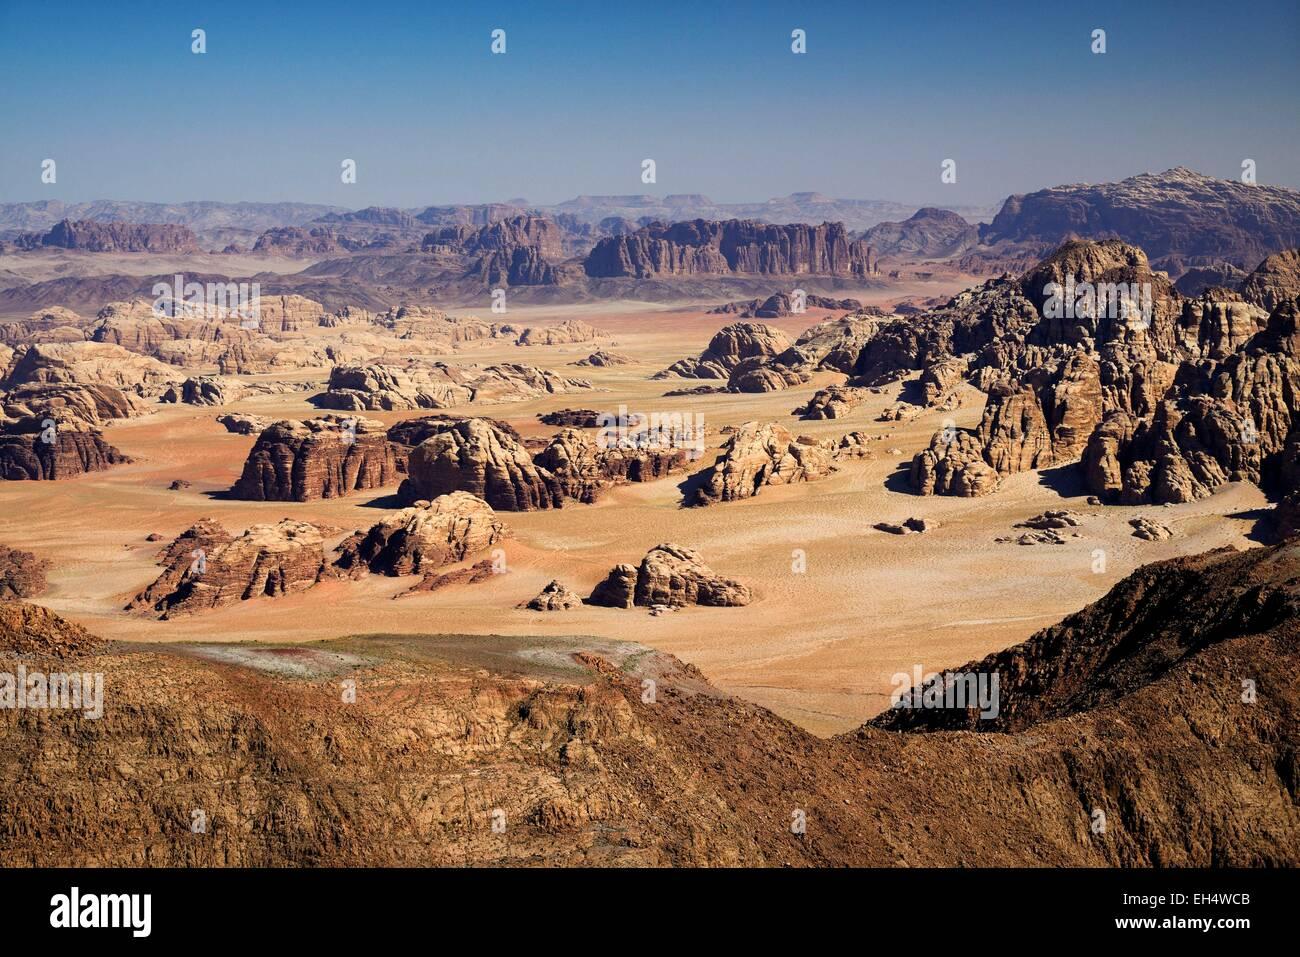 Jordania, Wadi Rum desert, frontera con Arabia Saudita, vista desde la cumbre de Jabal Umm Adaami (1832m), la montaña Imagen De Stock